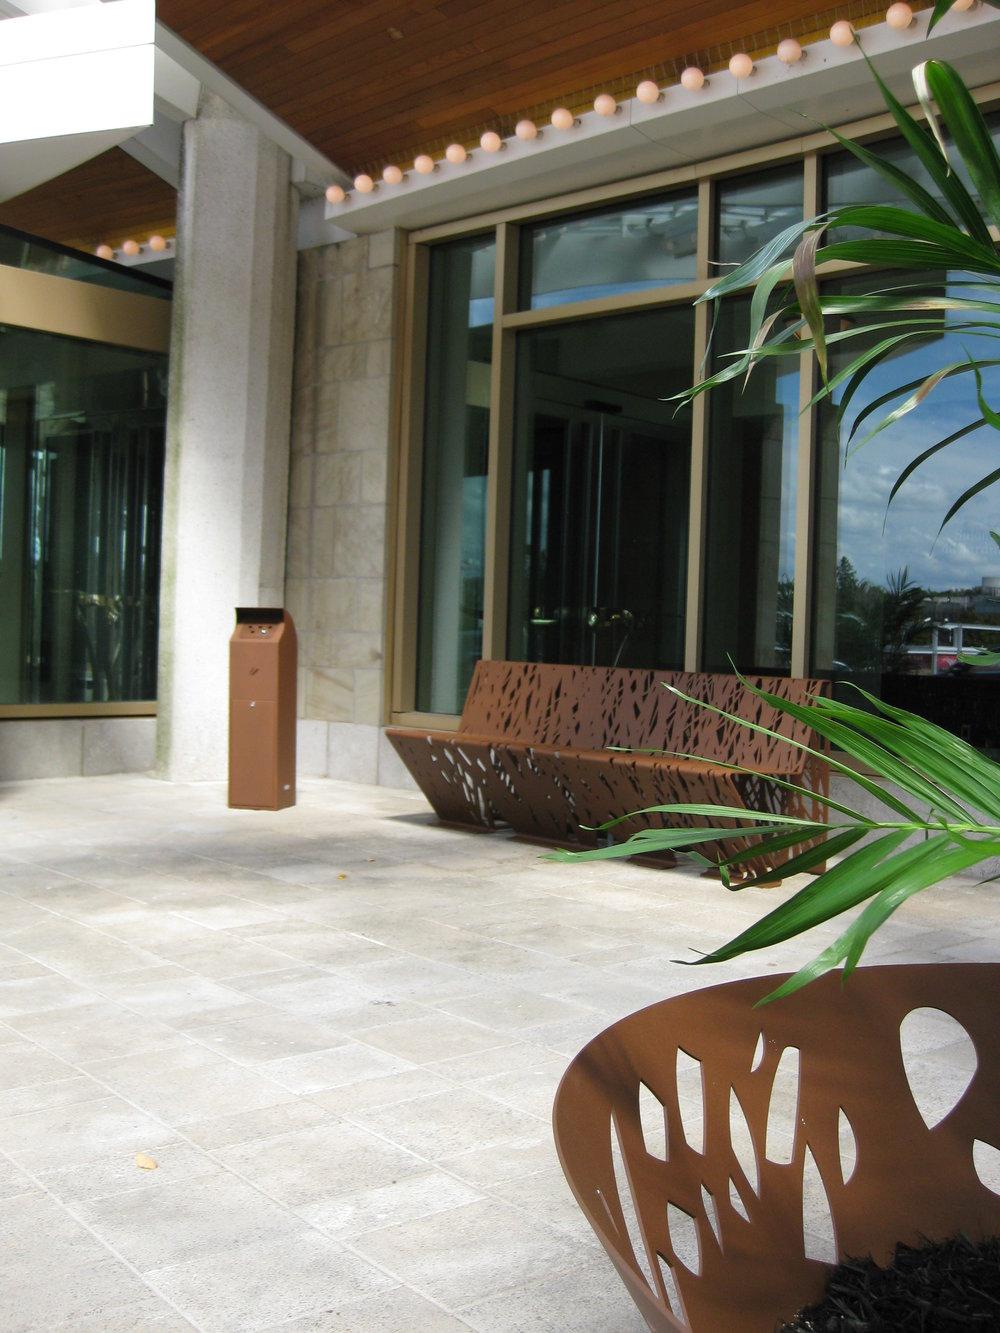 Hôtel Hilton, Casino Lac Leamy sept 2014 (11).jpg